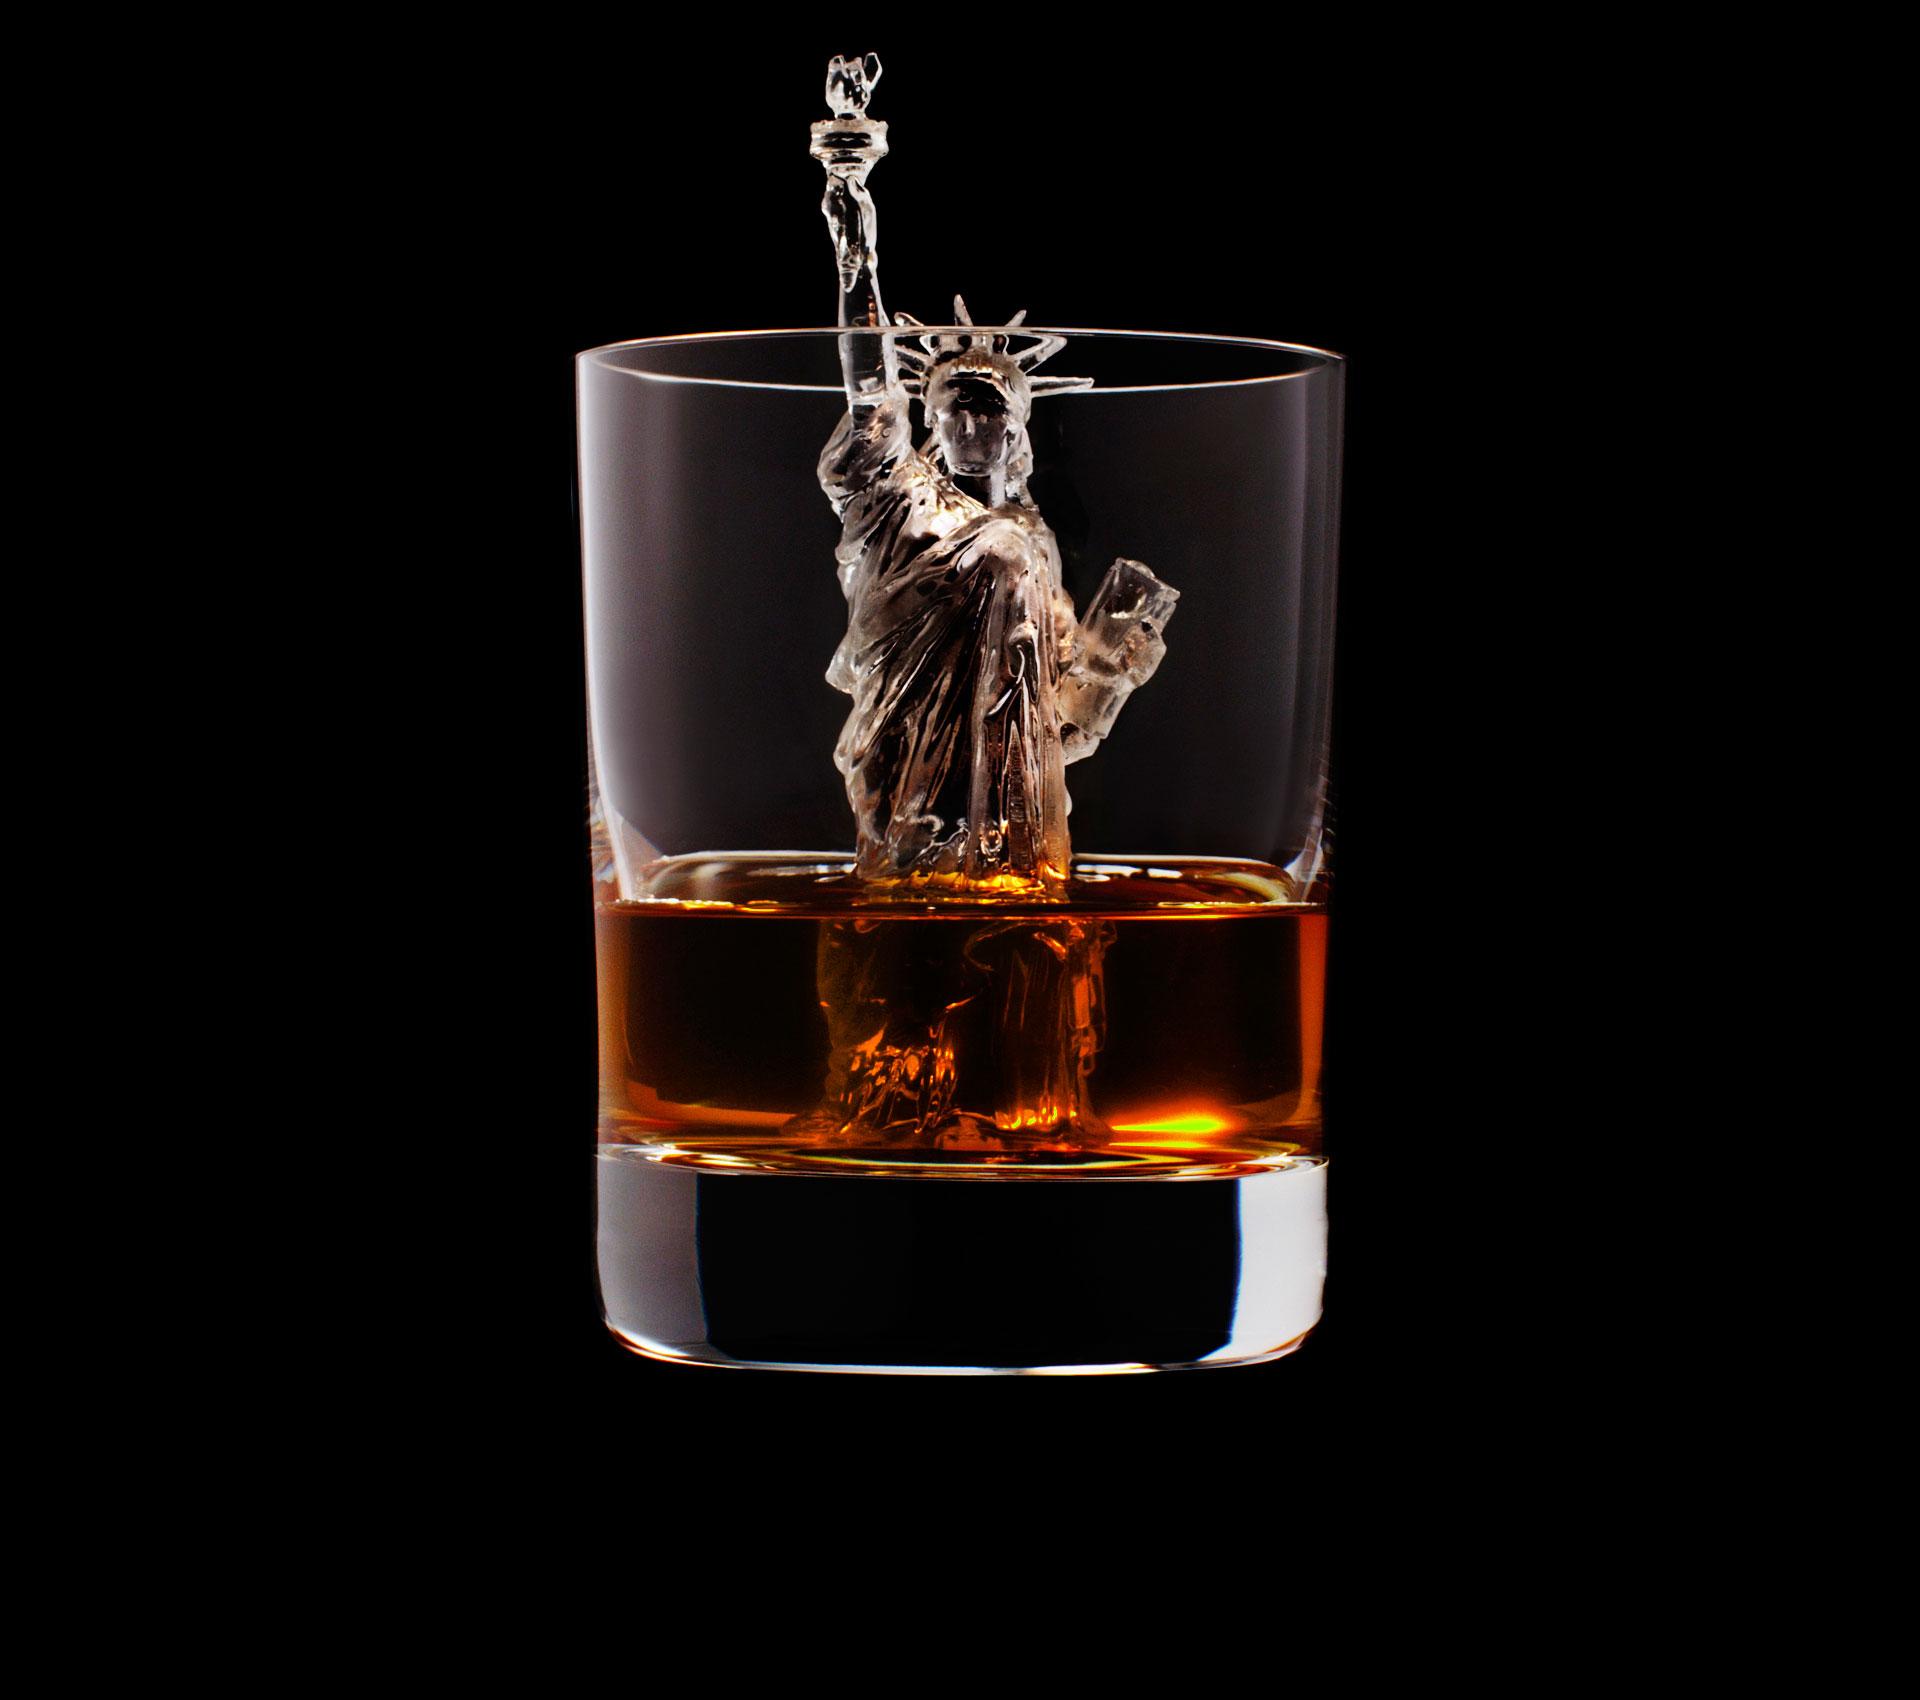 dans-ta-pub-whisky-tbwa-suntory-ice-cubes-6